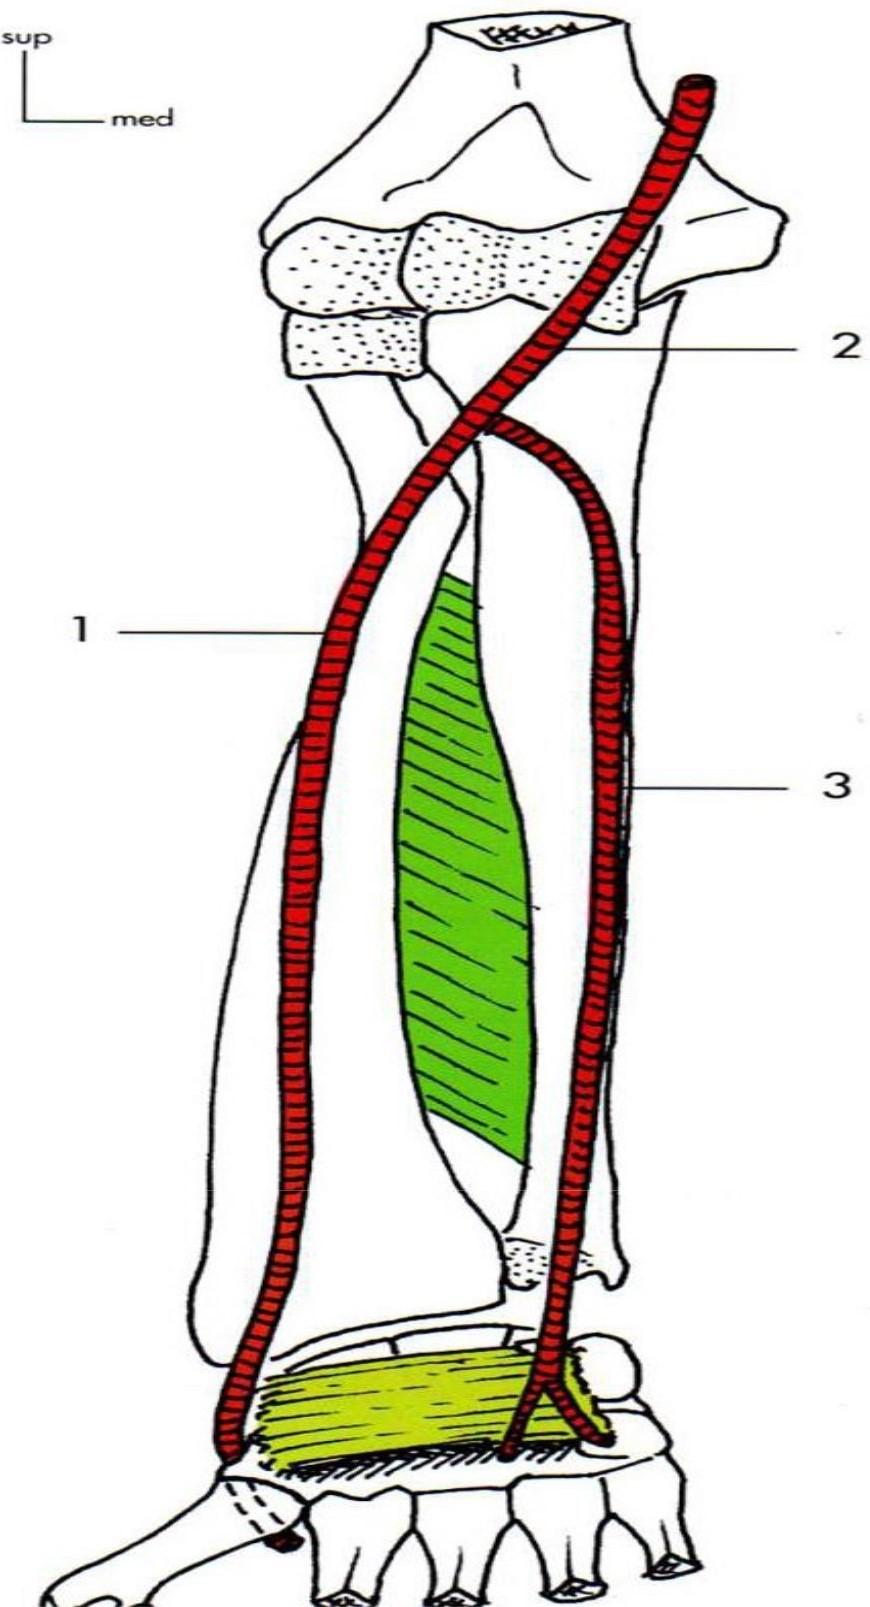 Les Artères de l'avant-bras Artere ulnaire Artere brachiale Artere radiale